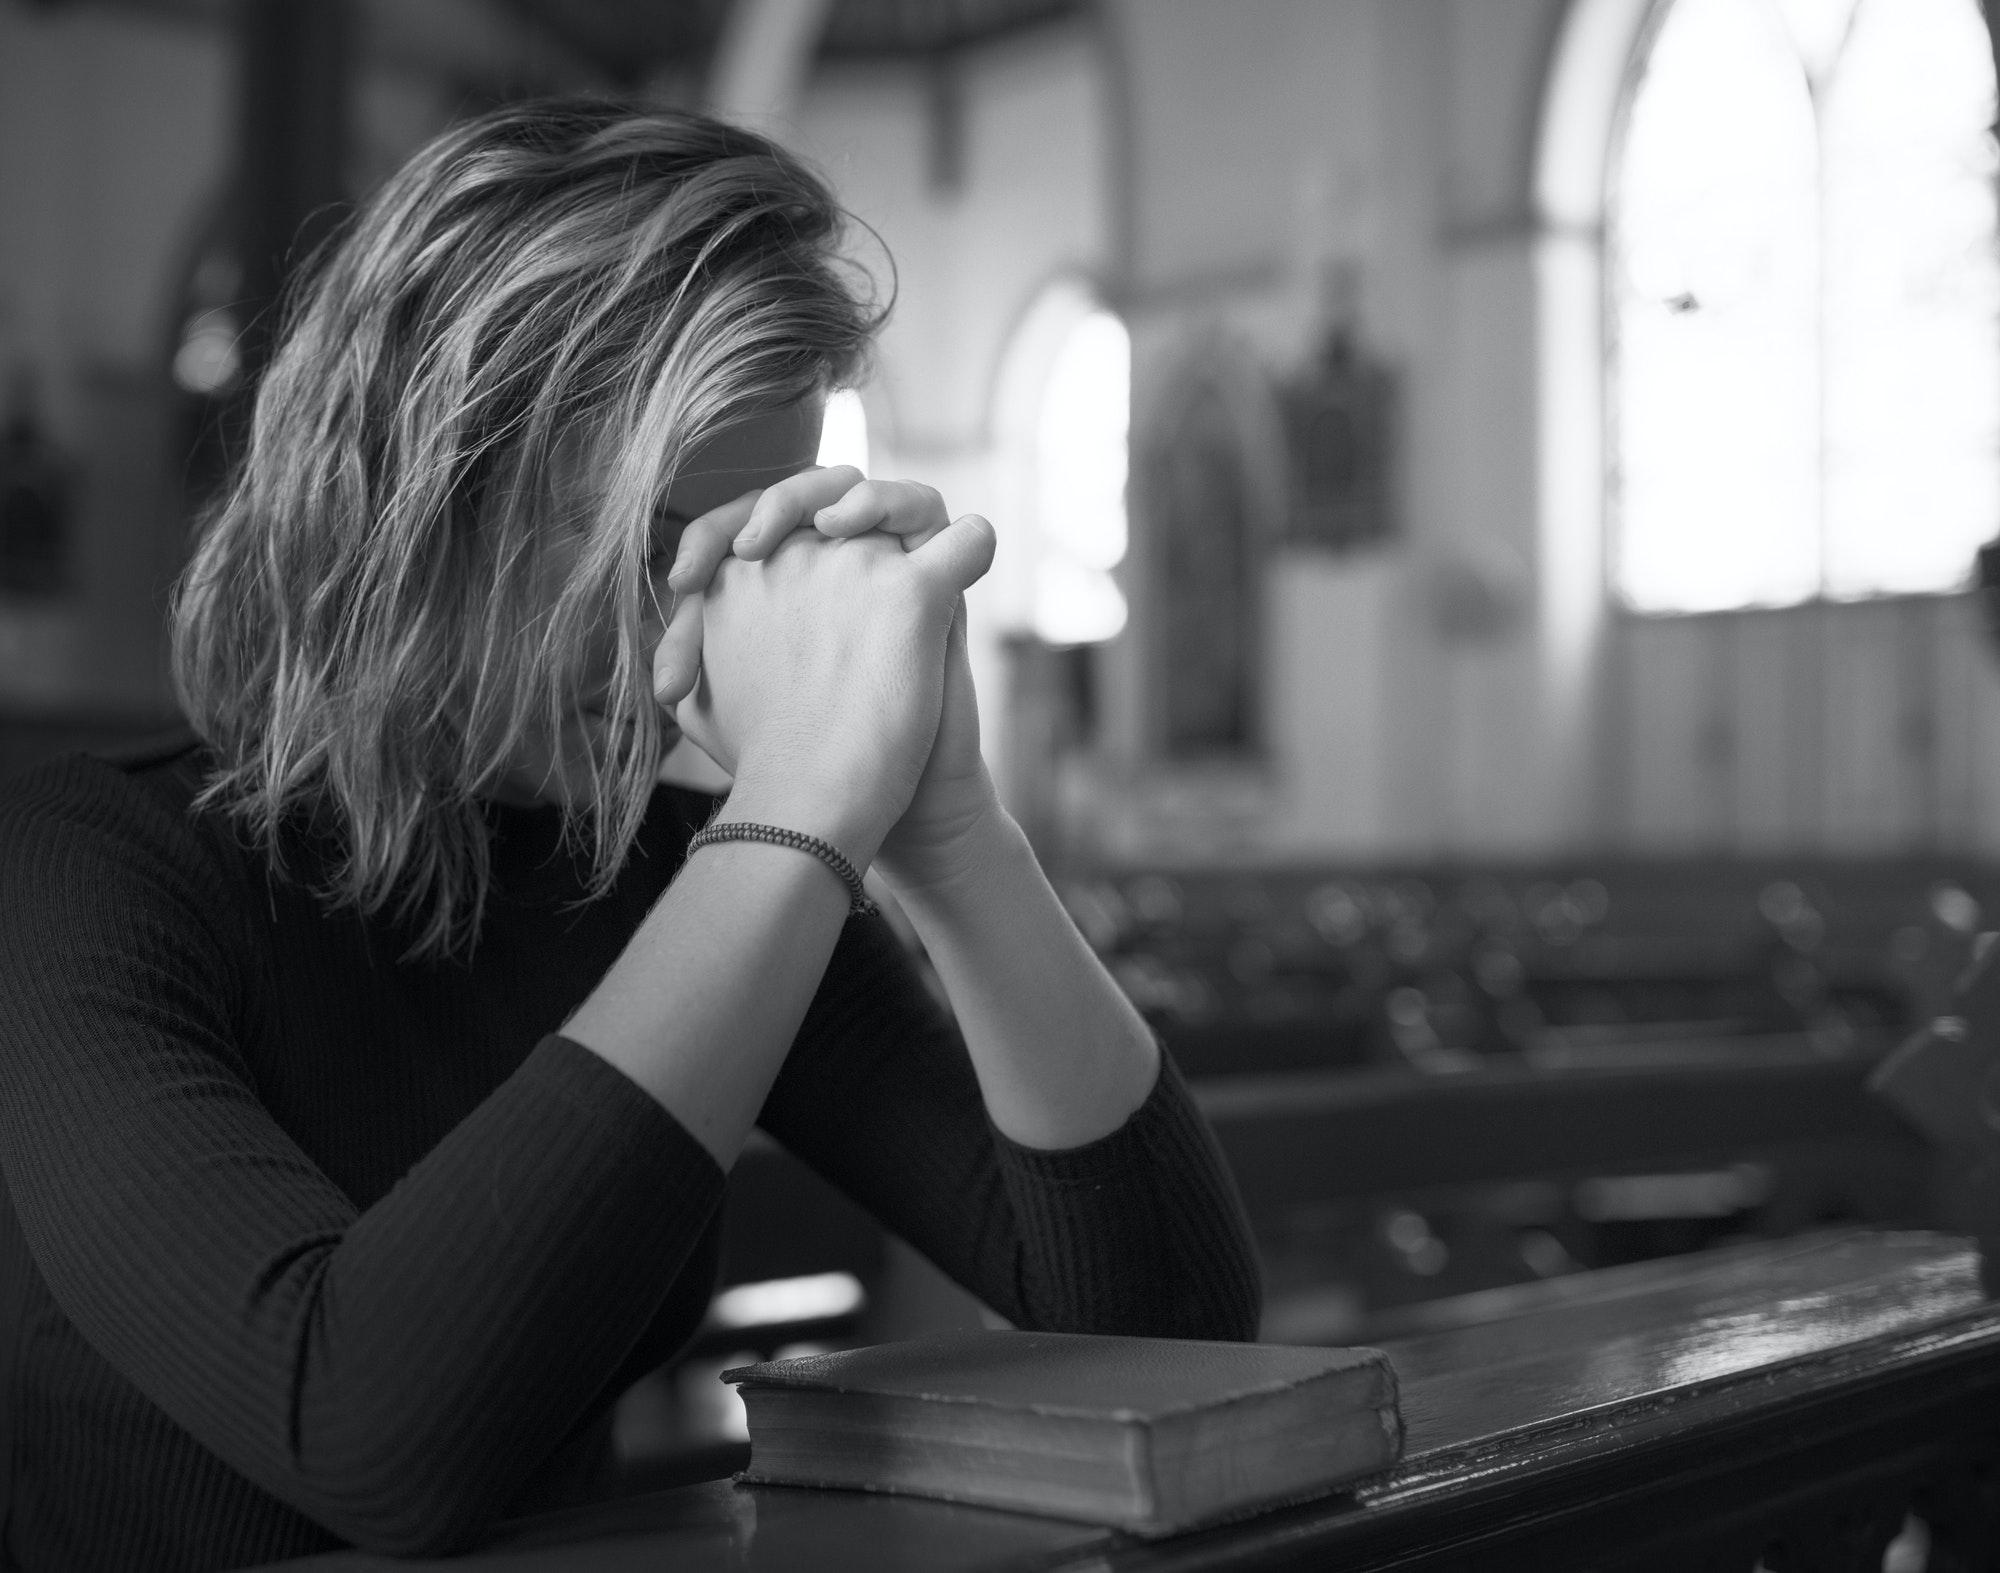 Woman praying in the church grayscale